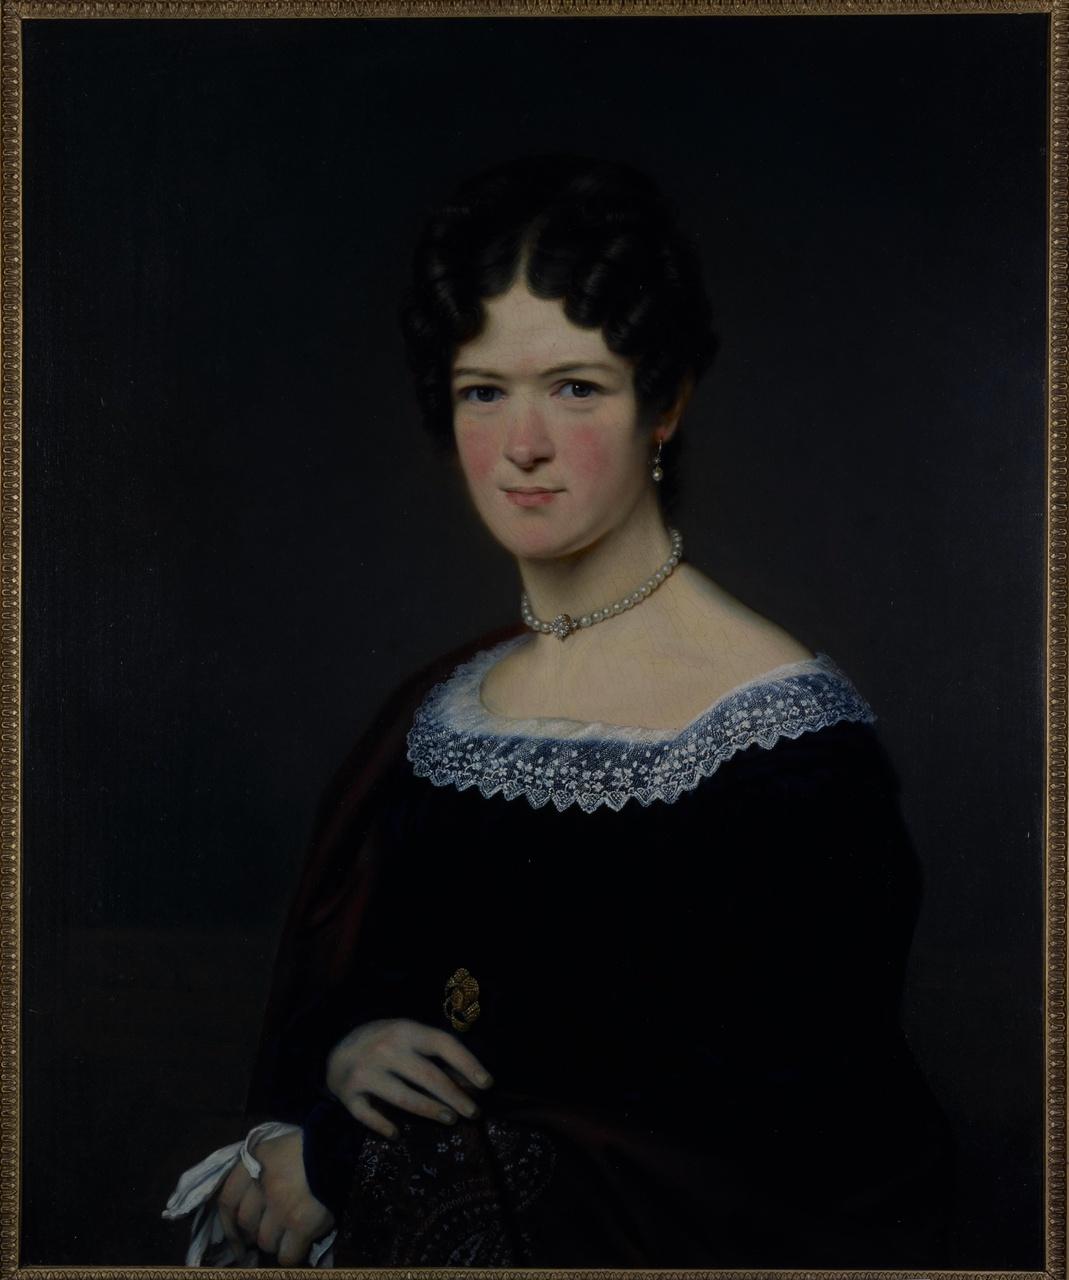 Portret van Susanna Jacoba Martens (1799-1860), echtgenote van Jacob Cobstantijn Martens van Sevenhoven